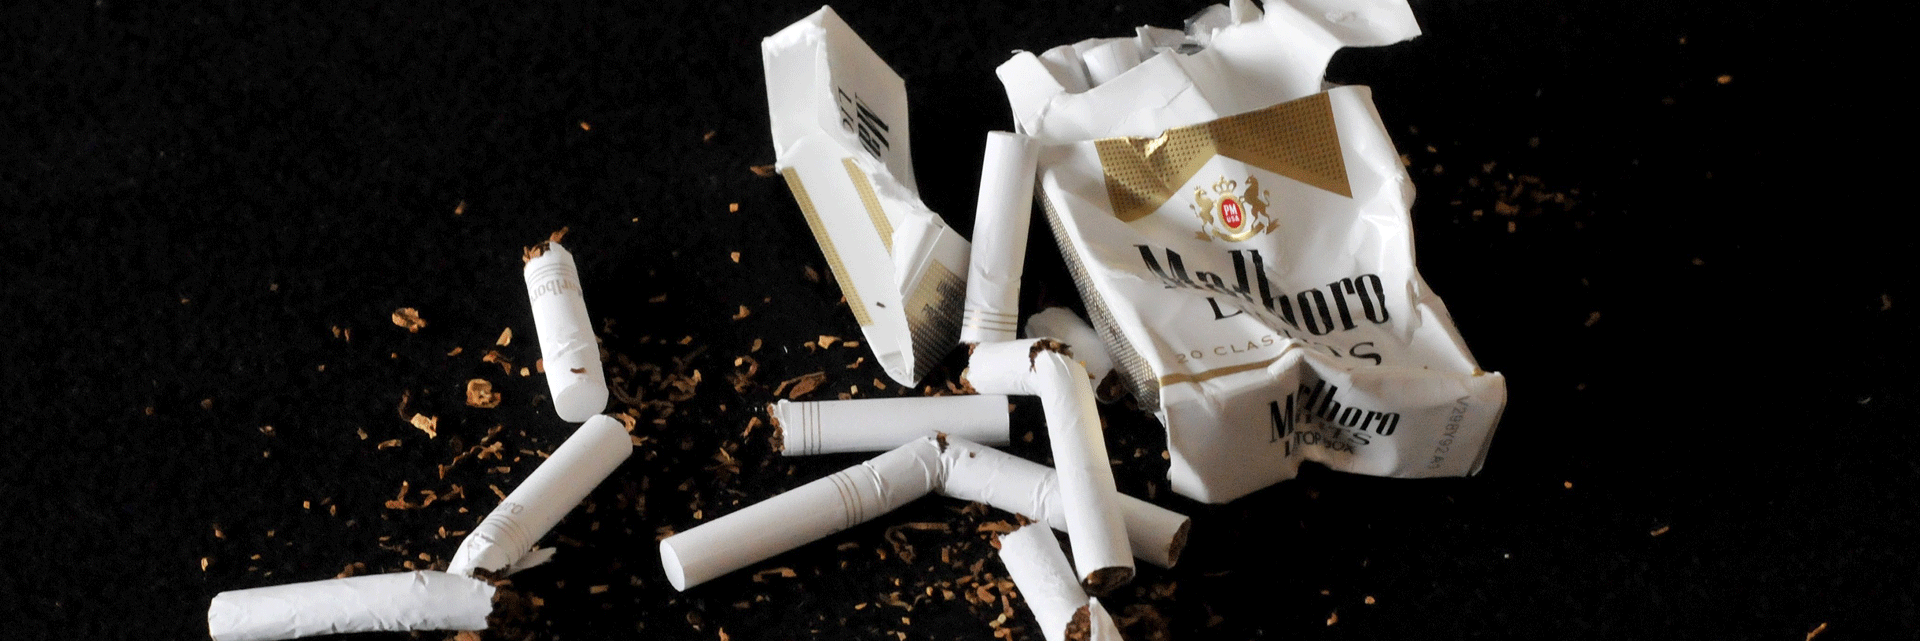 Best way to stop smoking naturally